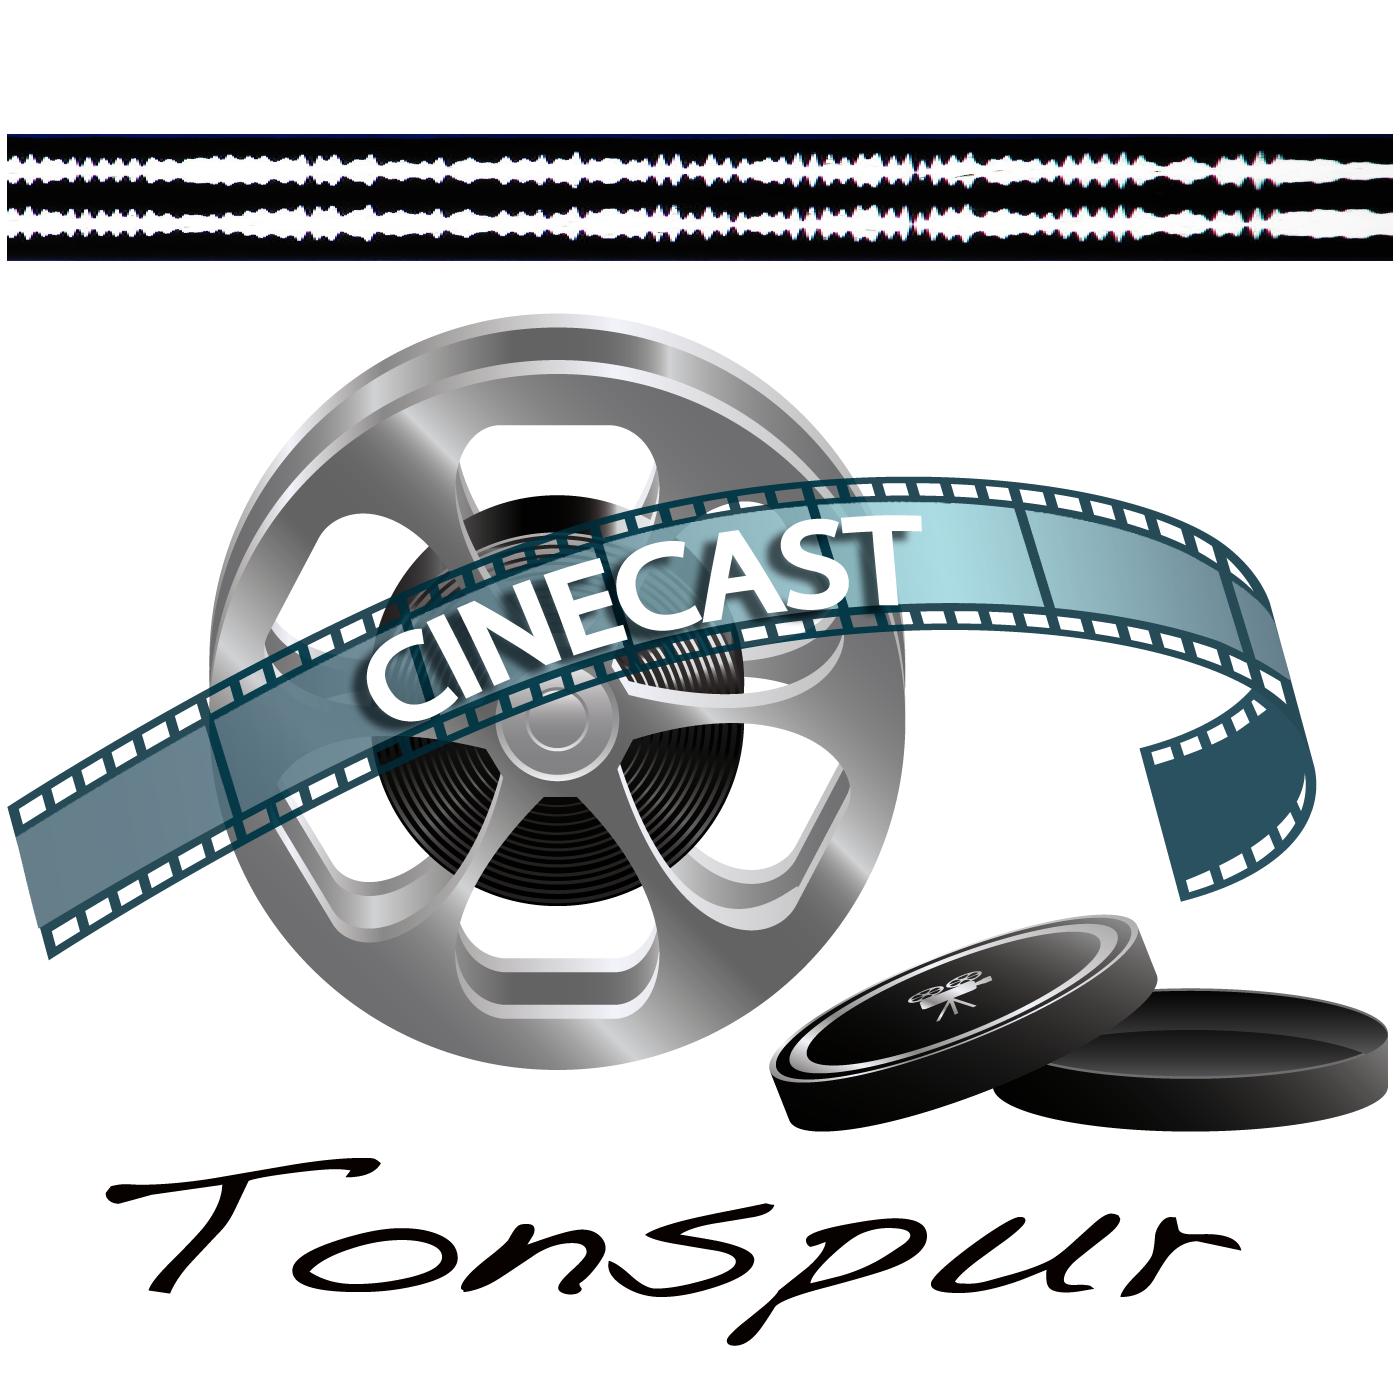 Cinecast Tonspur